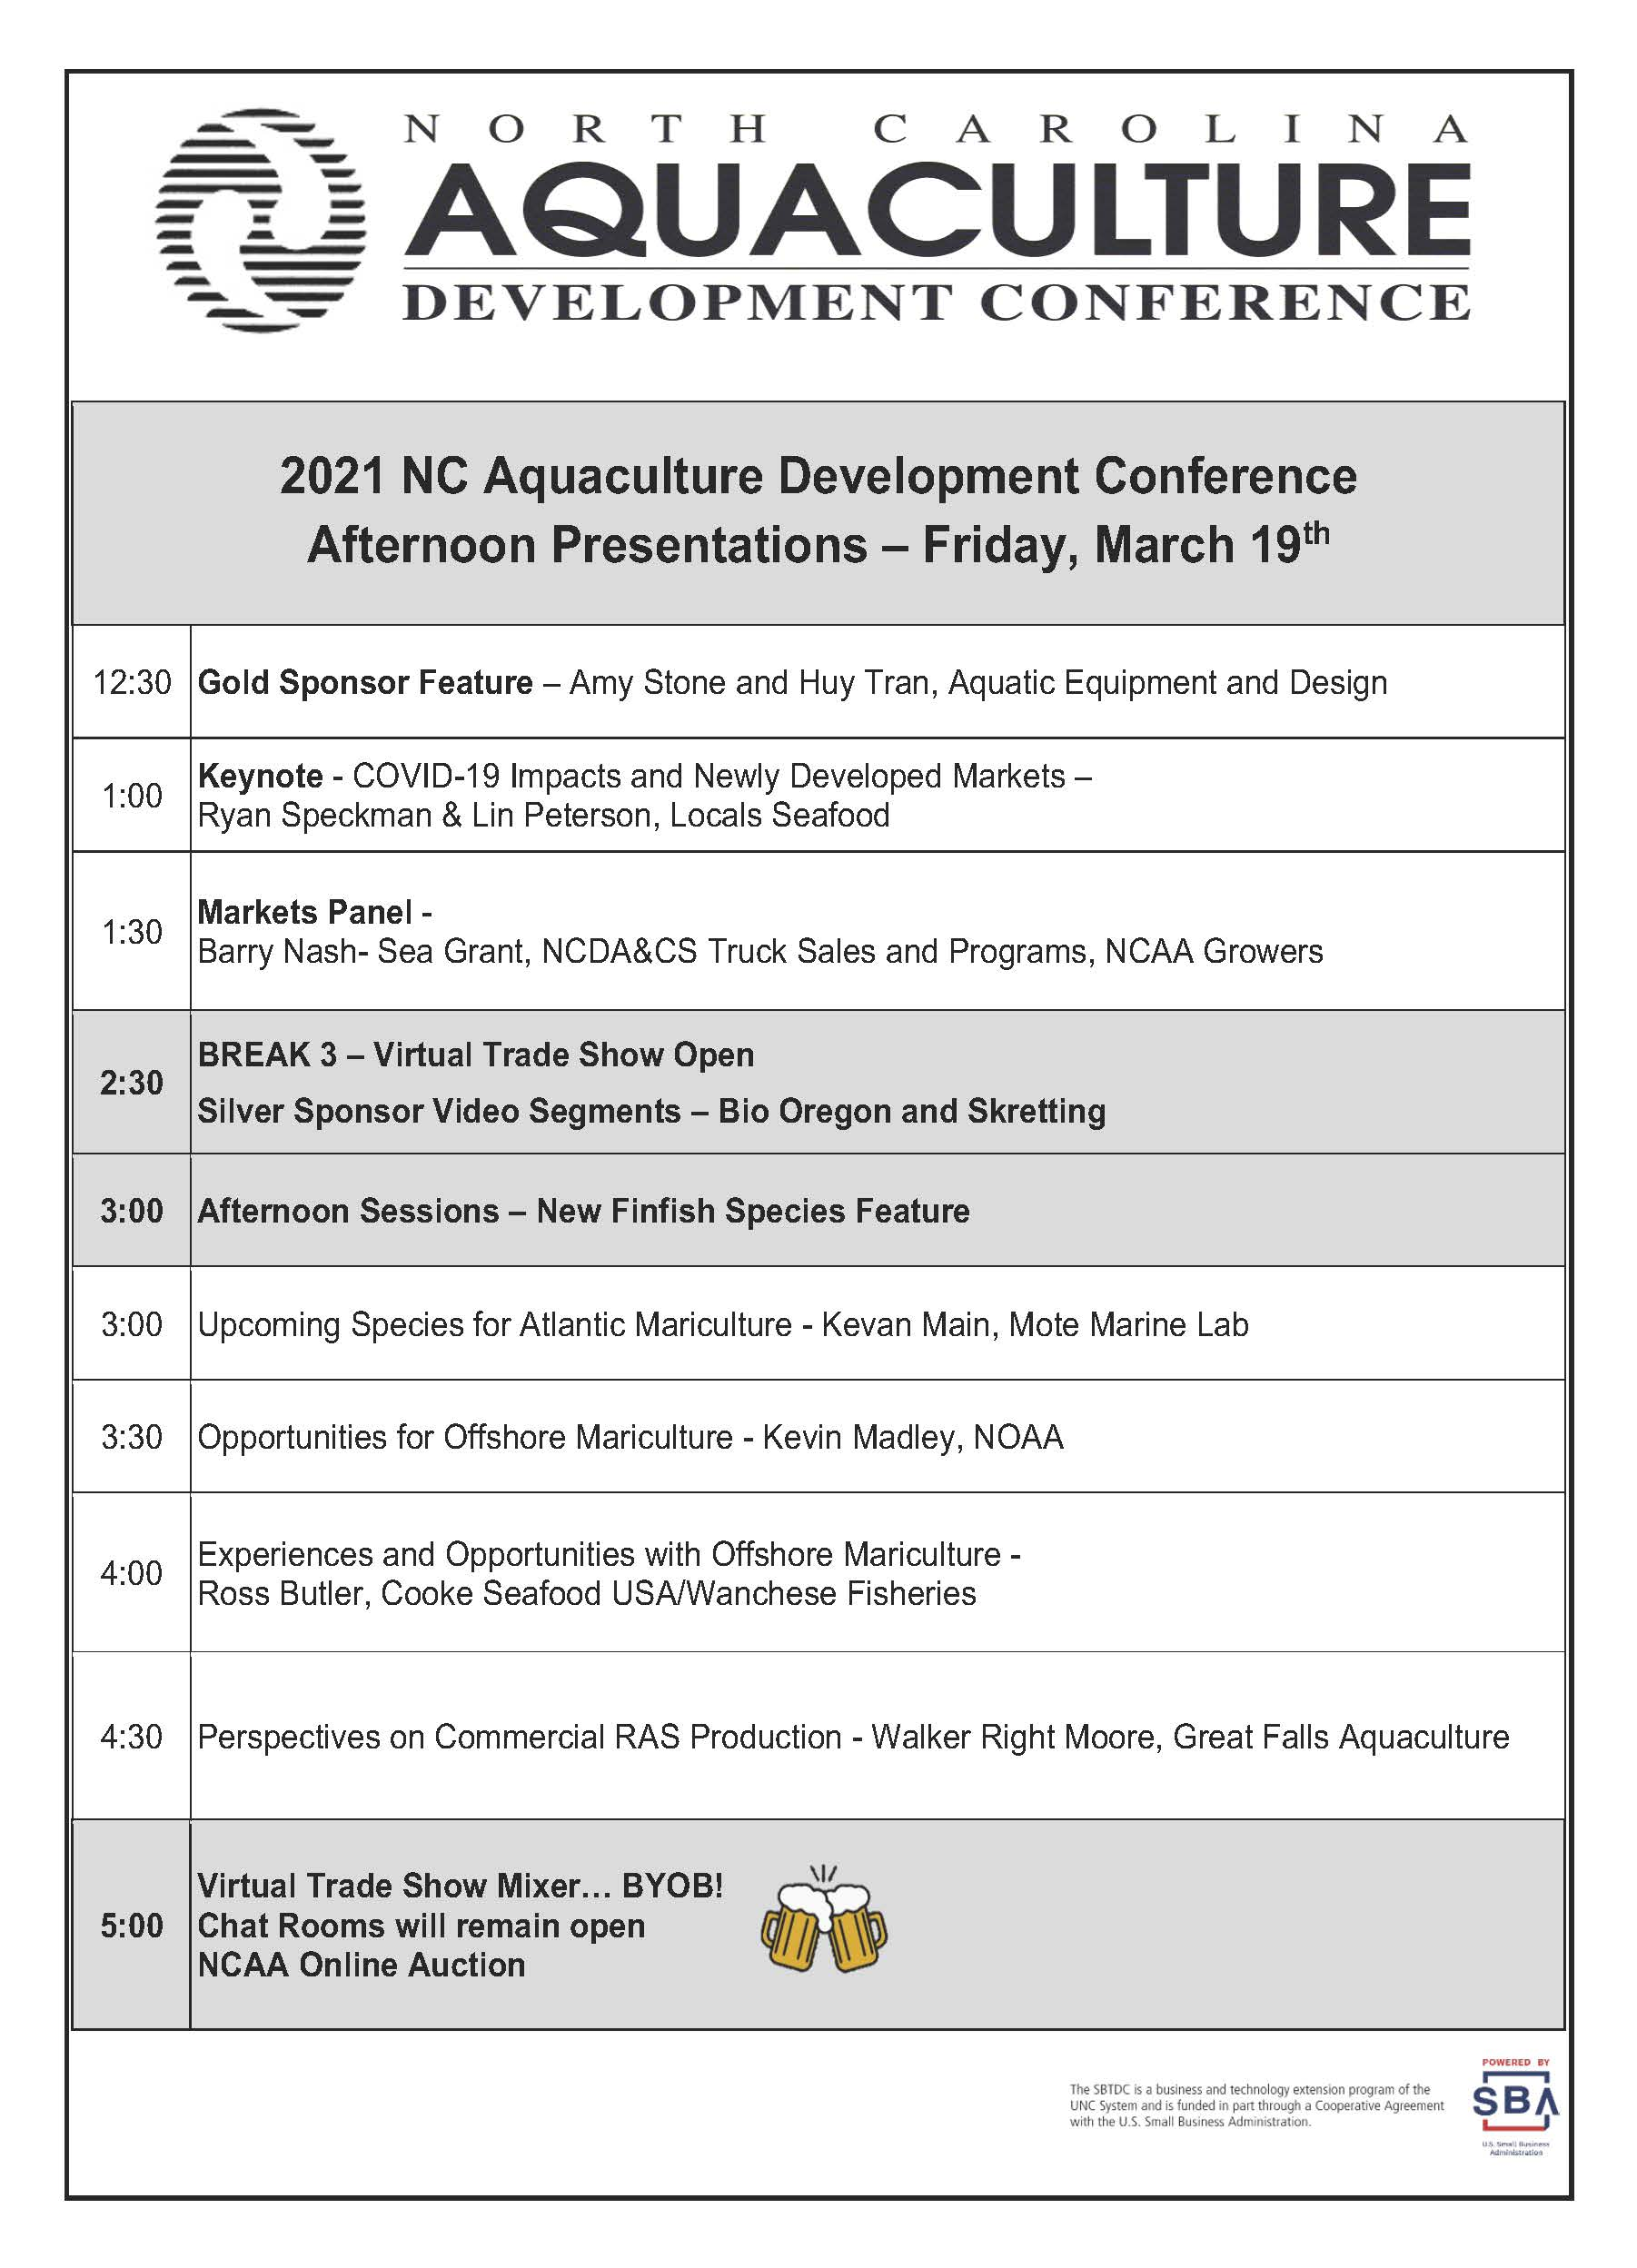 Friday conference agenda 2